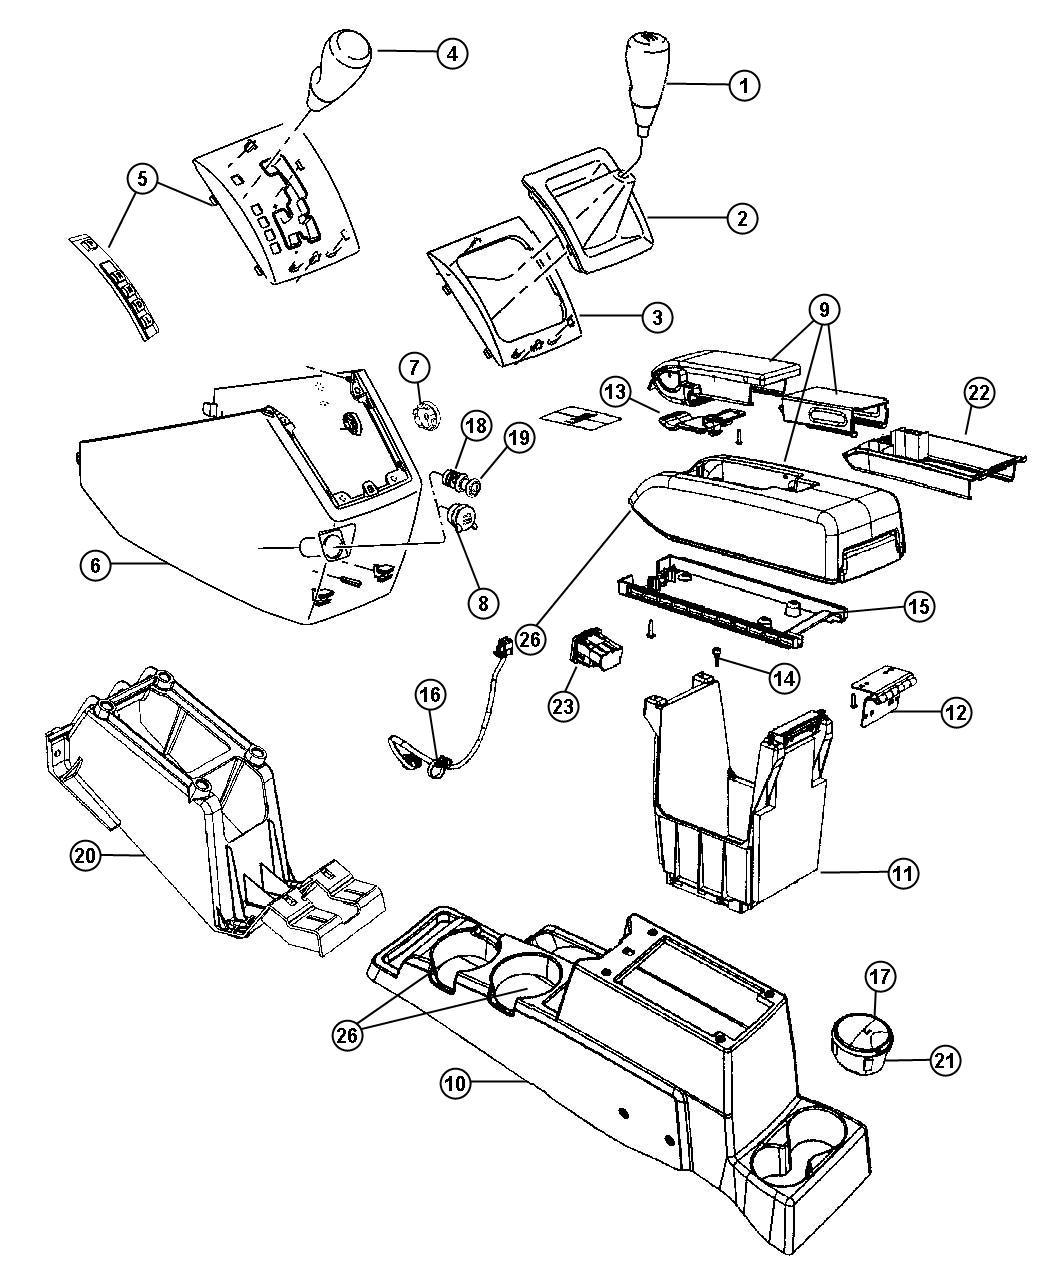 2009 Dodge Caliber Bezel. Console shifter. [cxp], [da][cxp